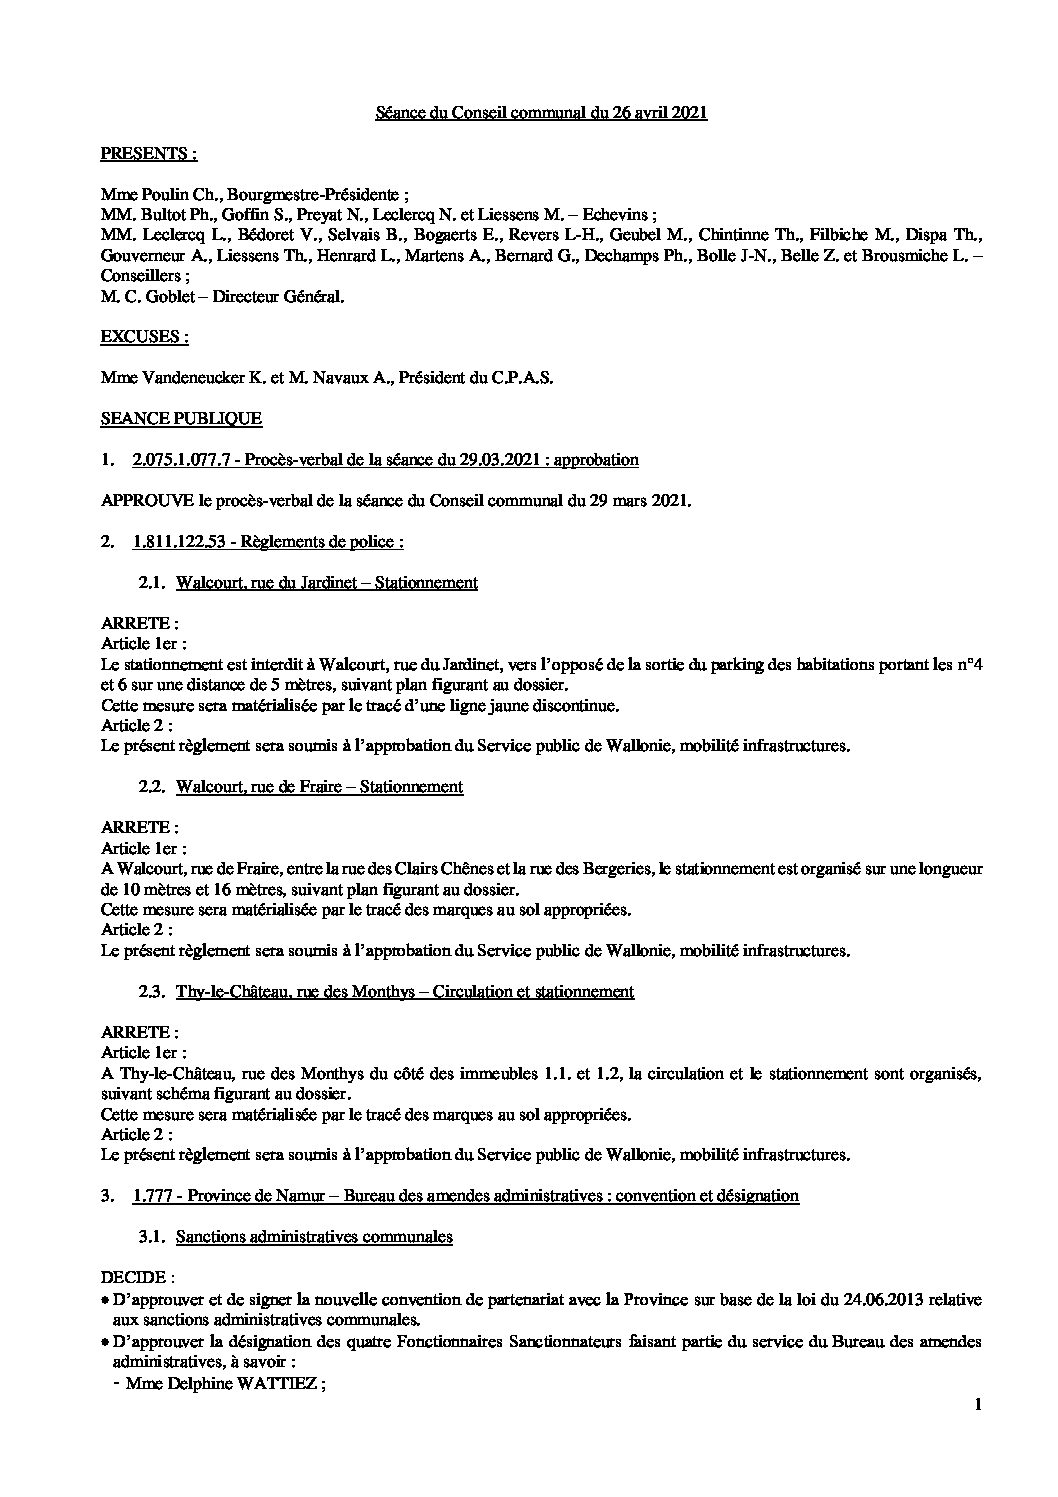 Conseil communal – 26 avril 2021